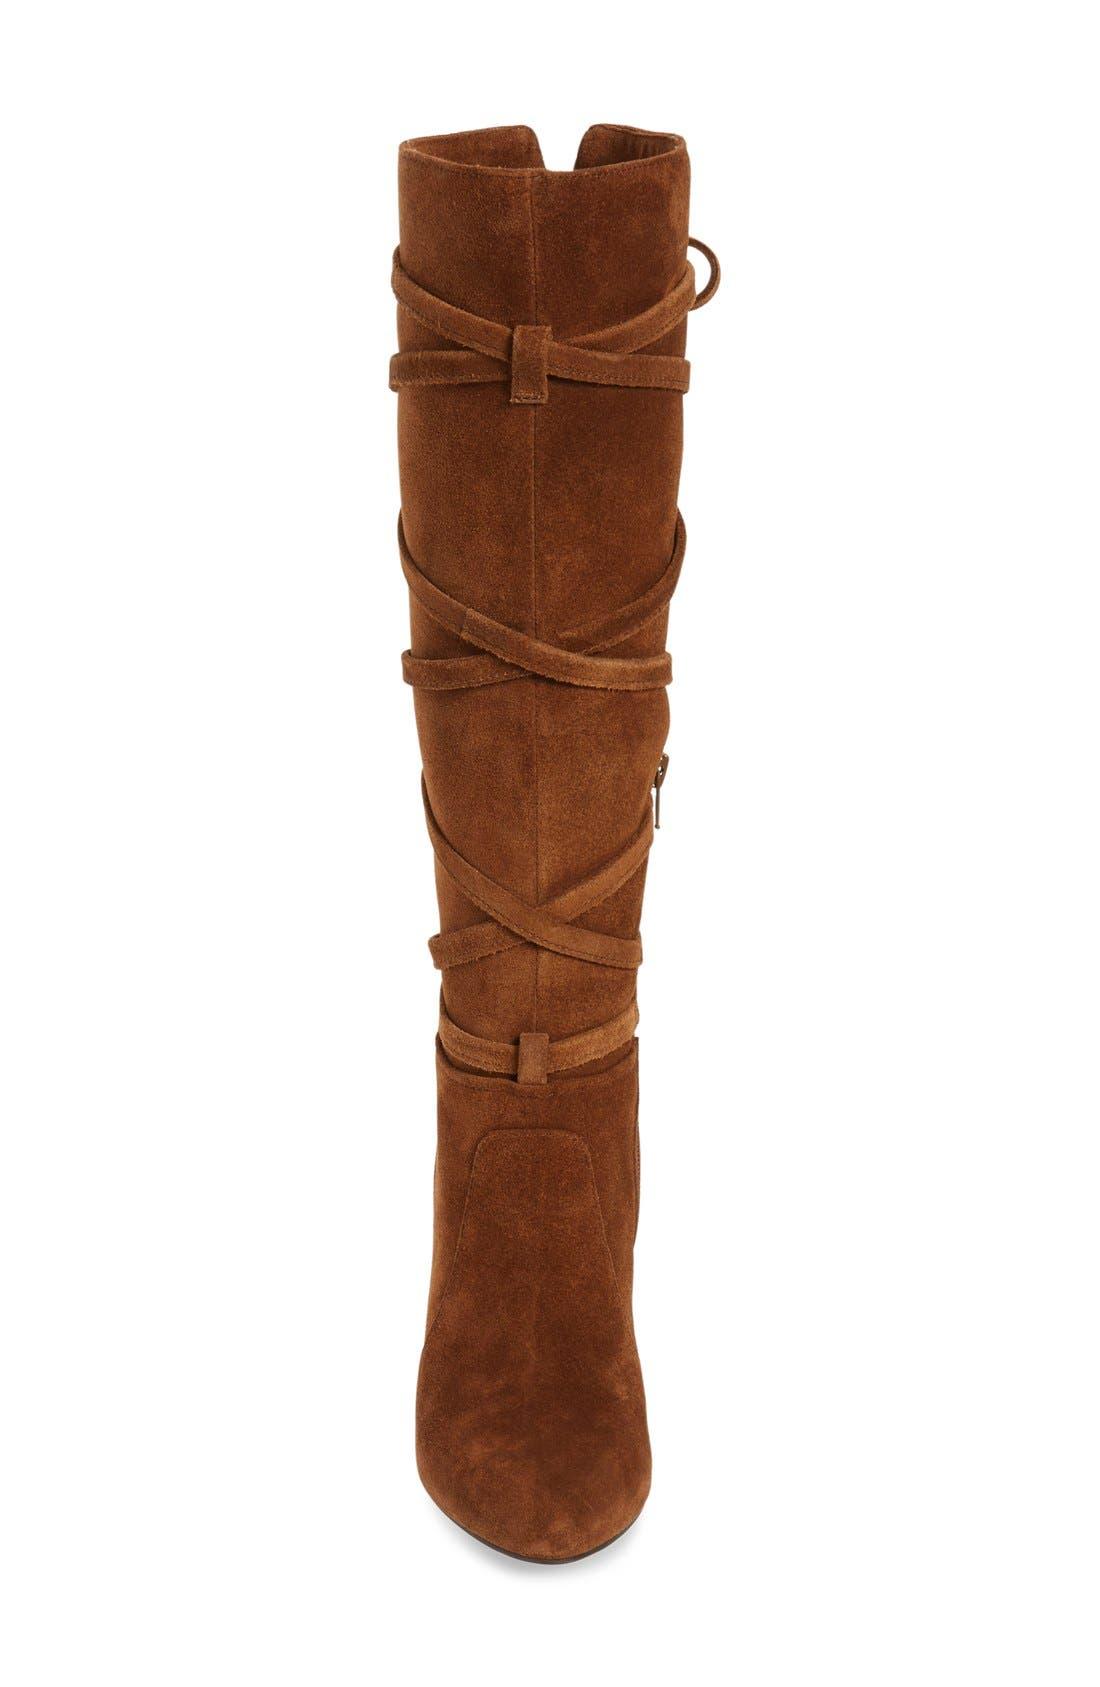 Alternate Image 3  - Vince Camuto 'Millay' Knee High Boot (Women)